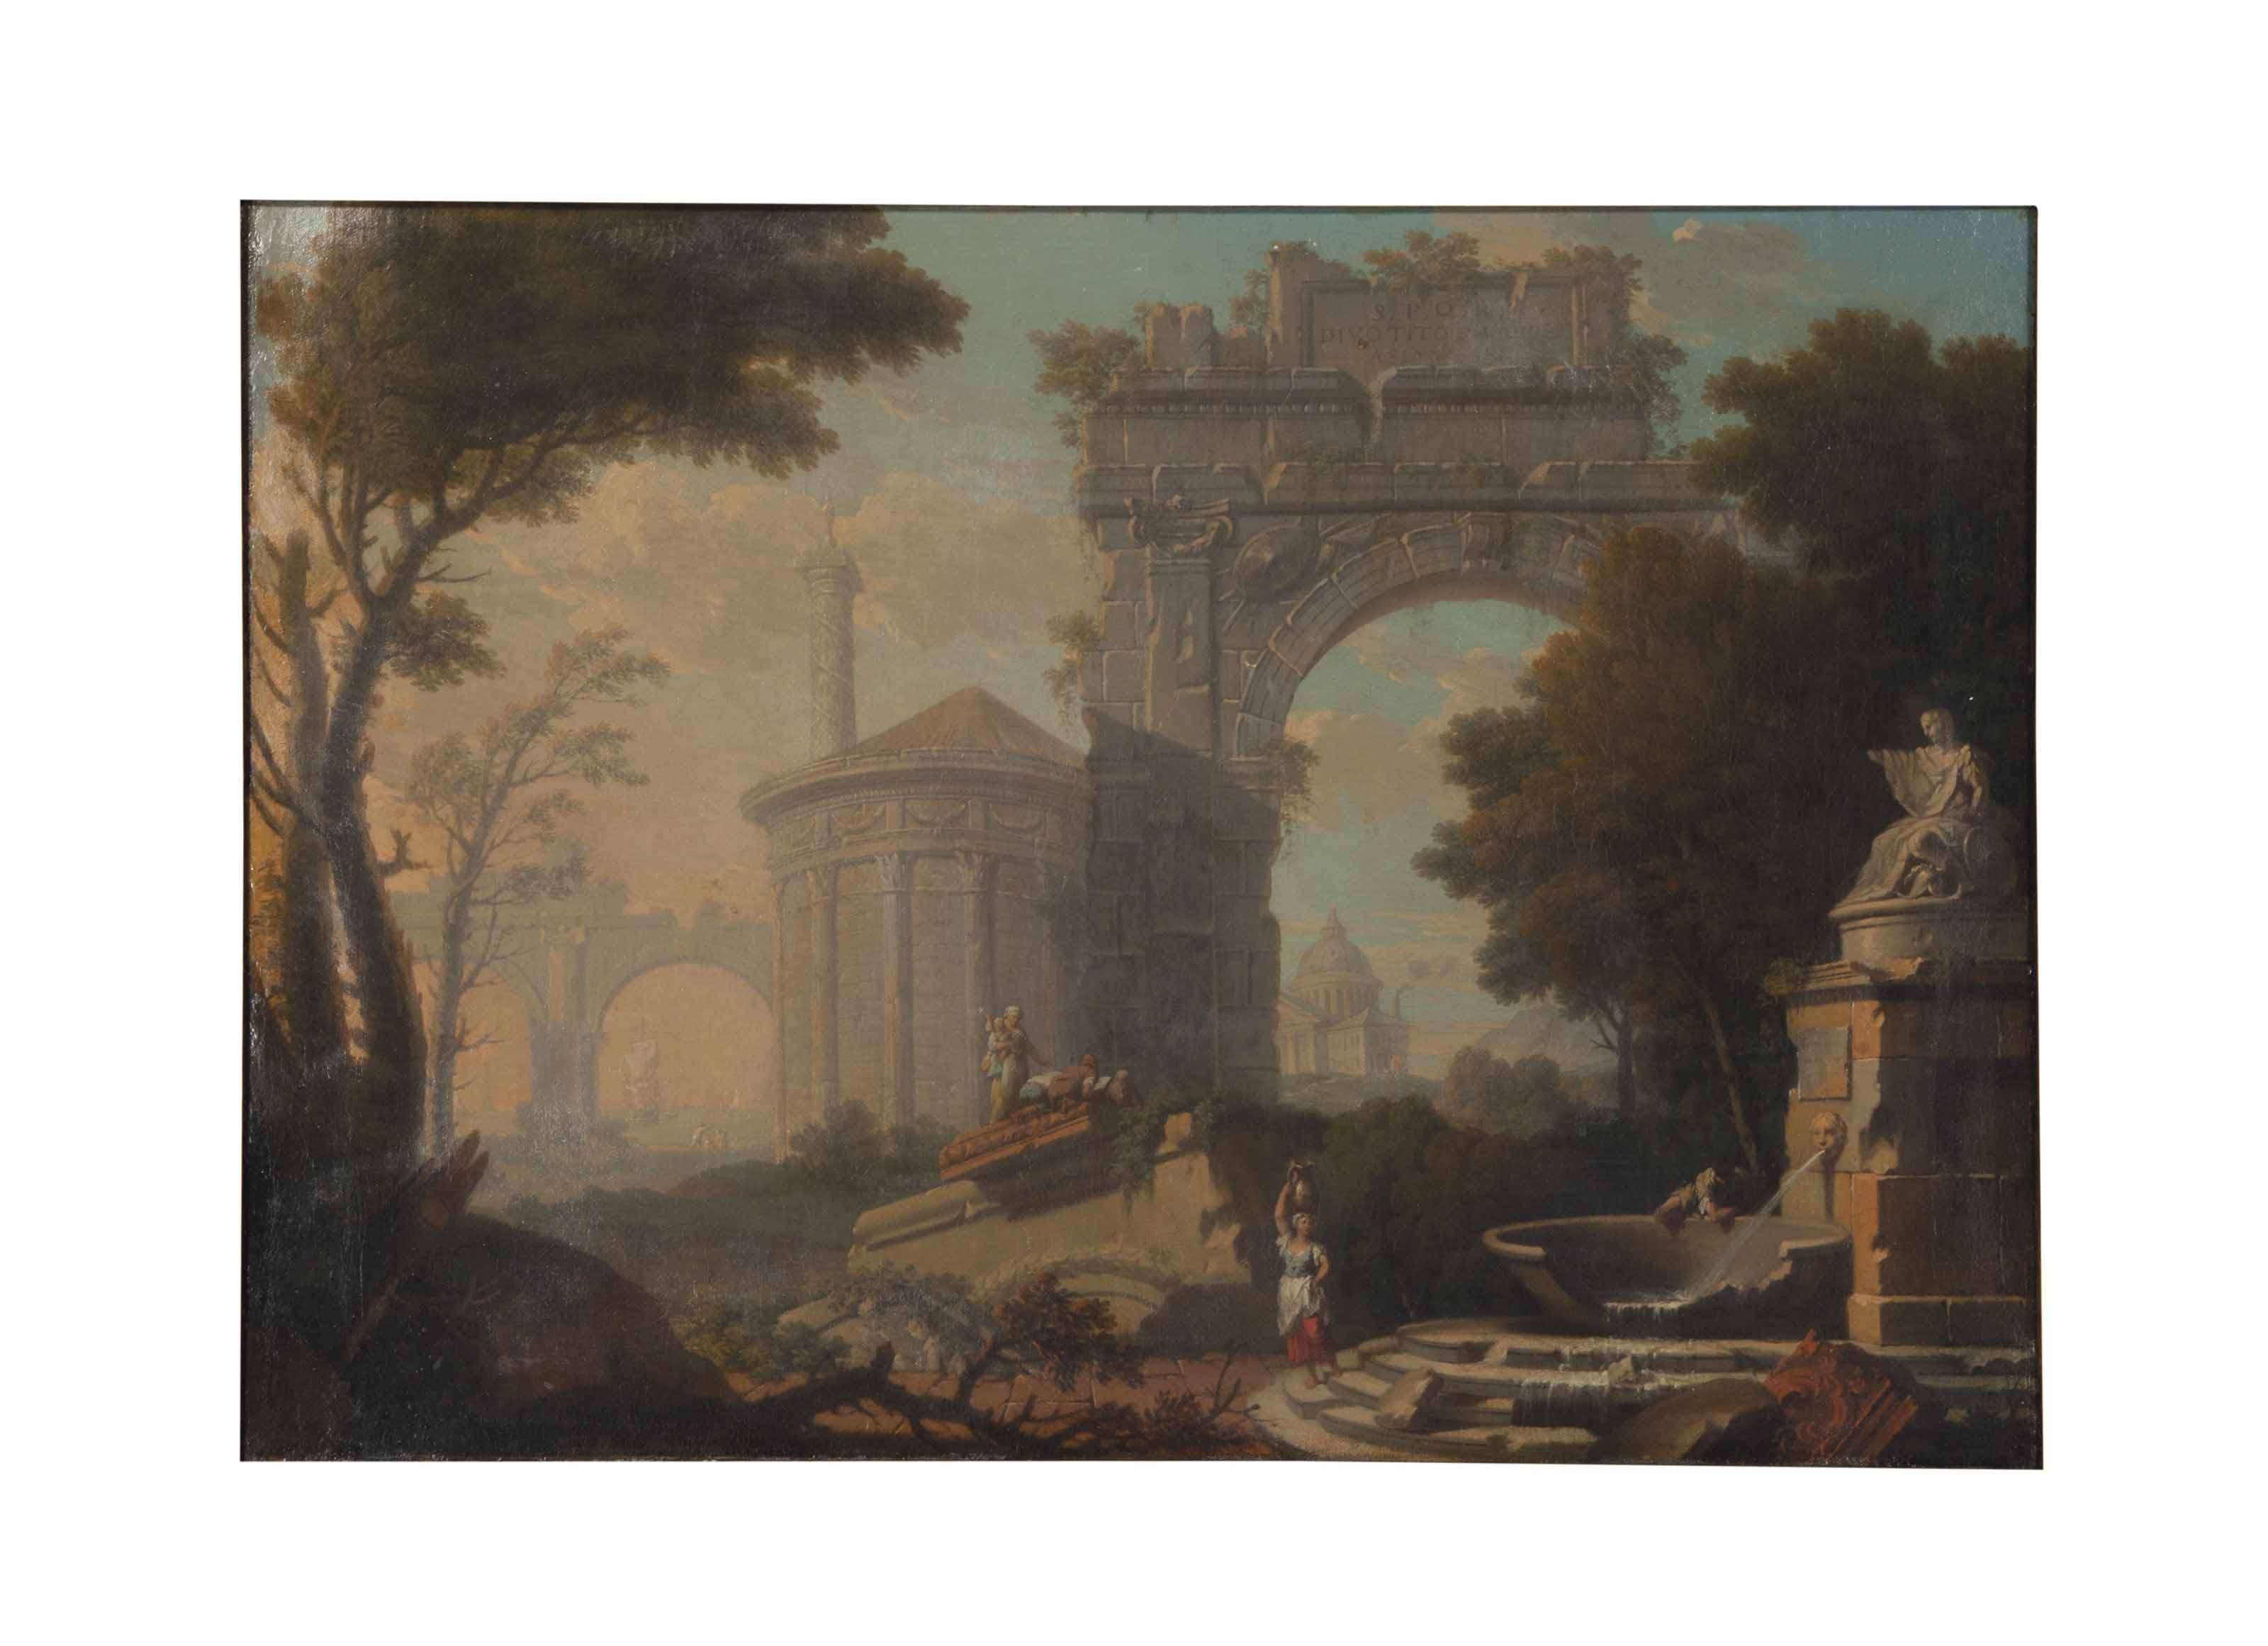 Cicle of Leonardo Coccorante (Italian, 1680-1750)